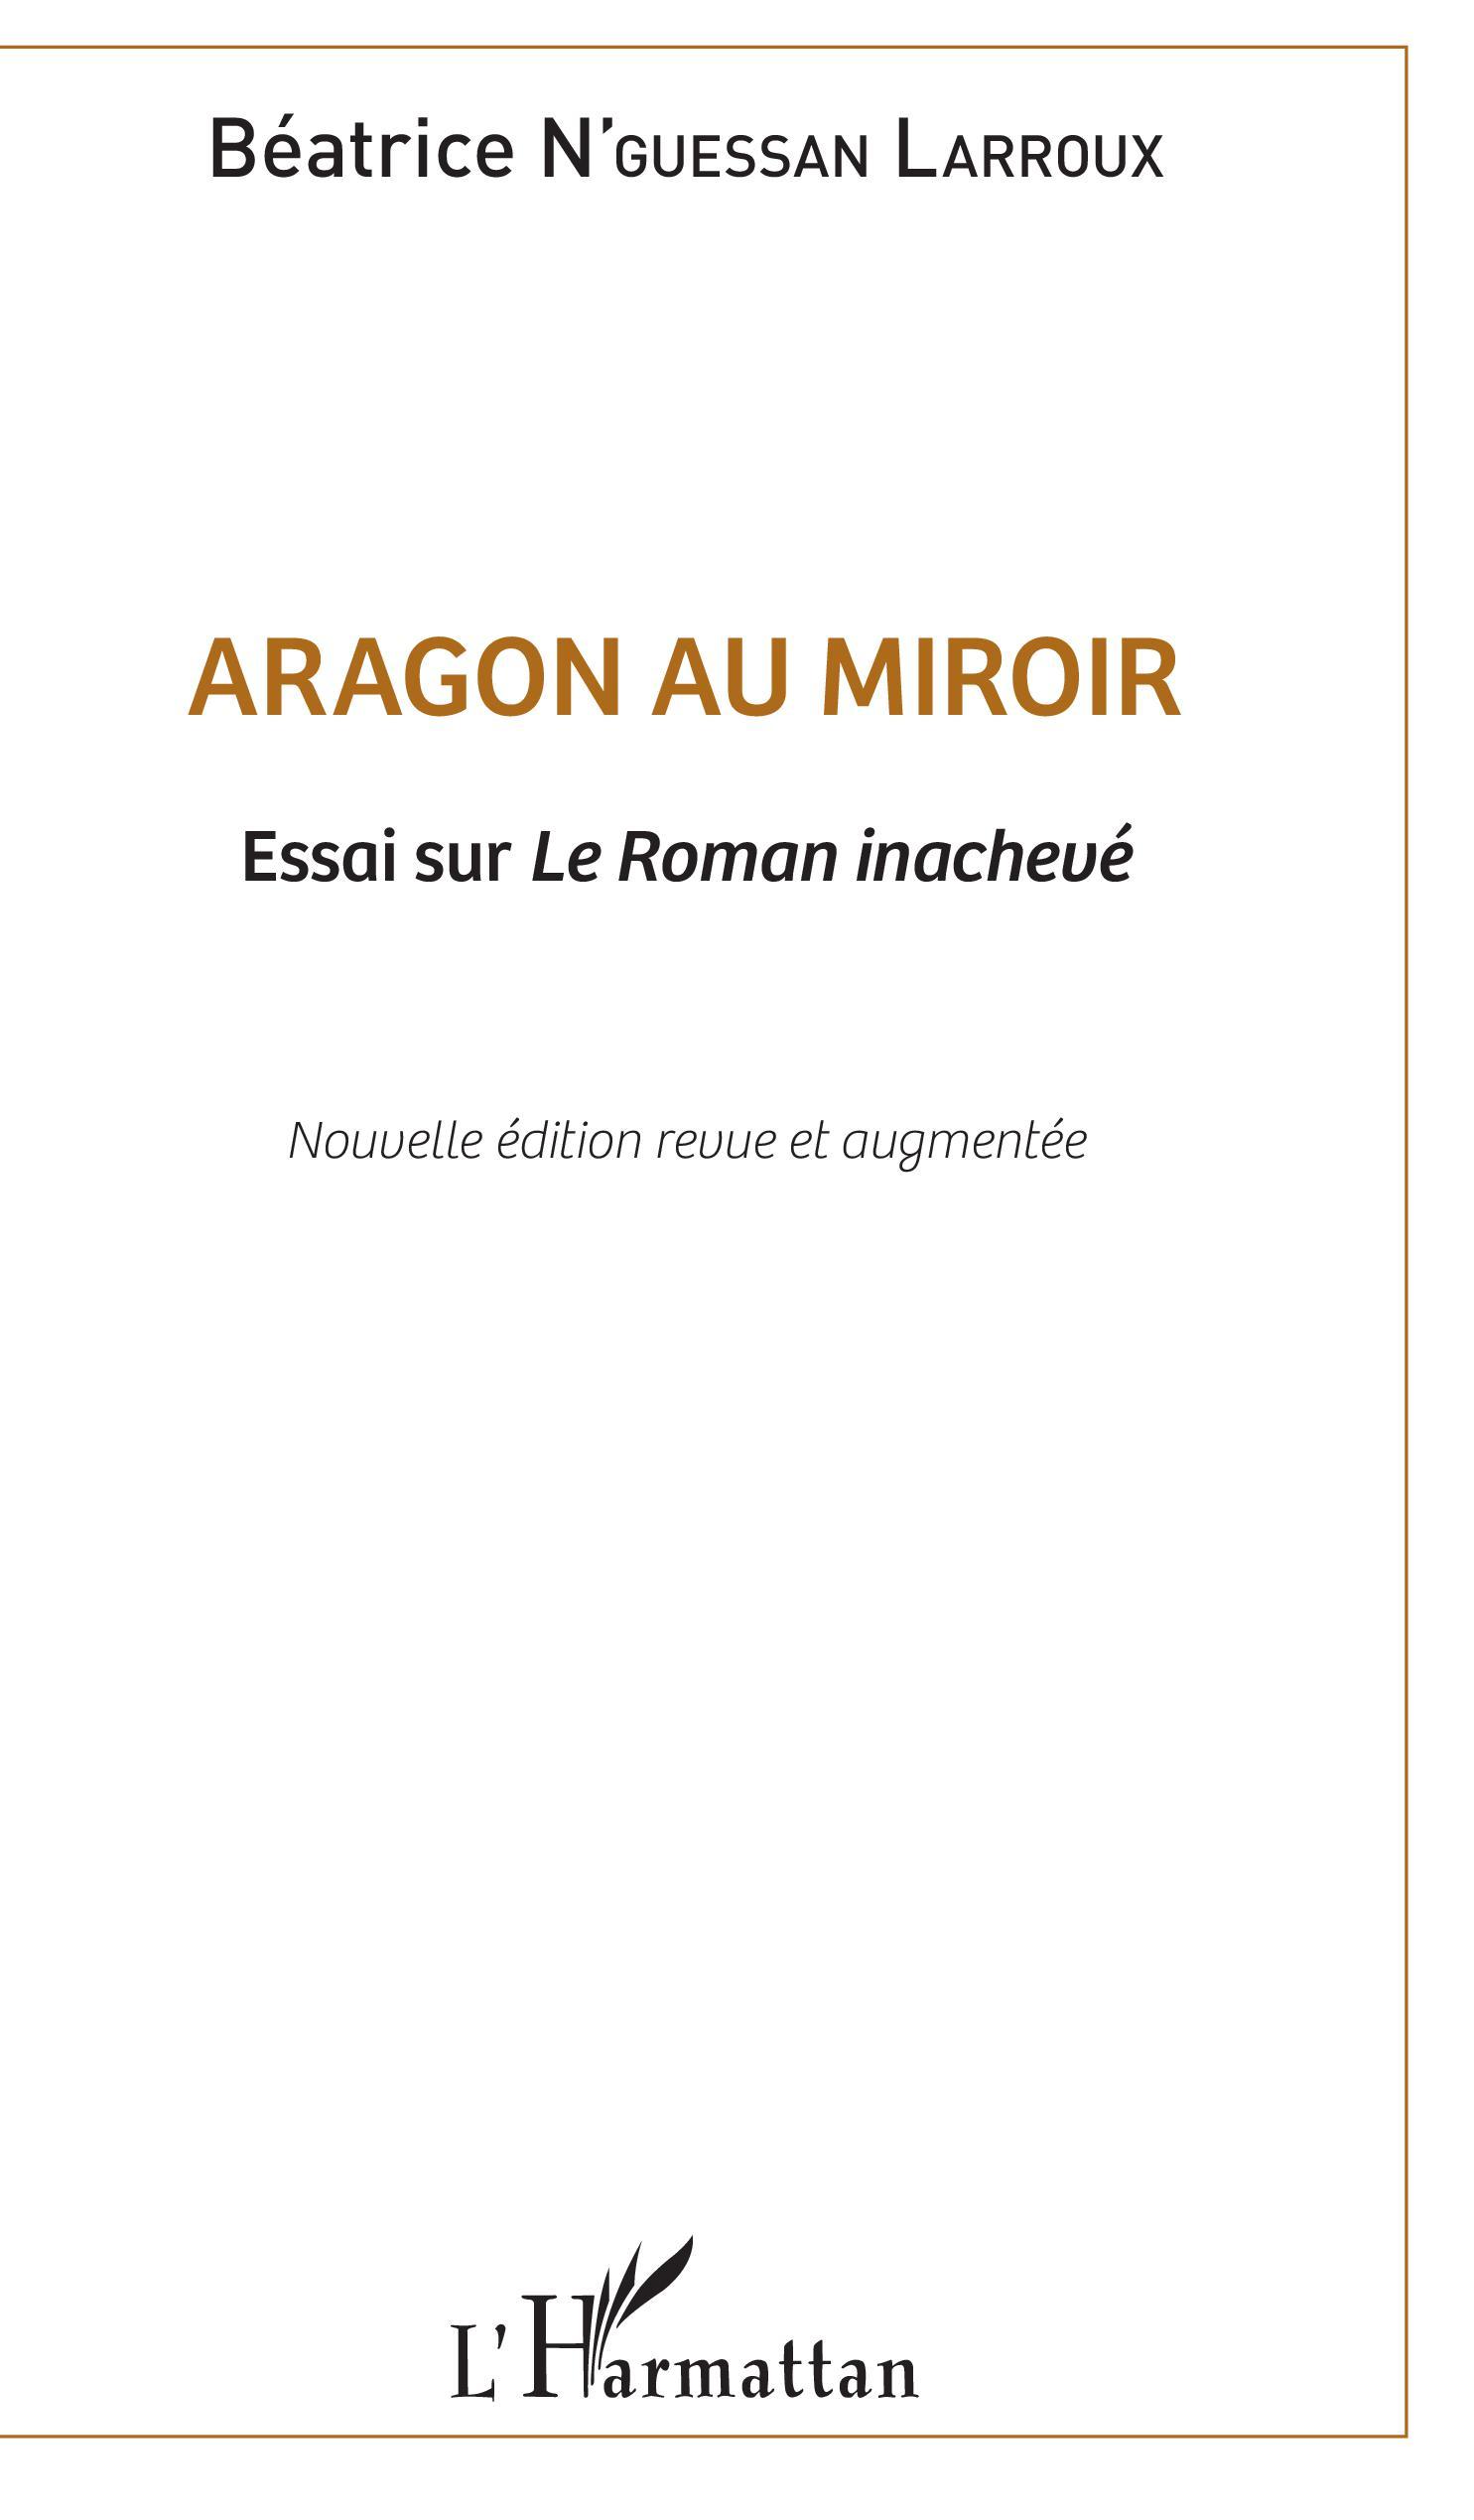 B. N'Guessan Larroux,Aragon au miroir